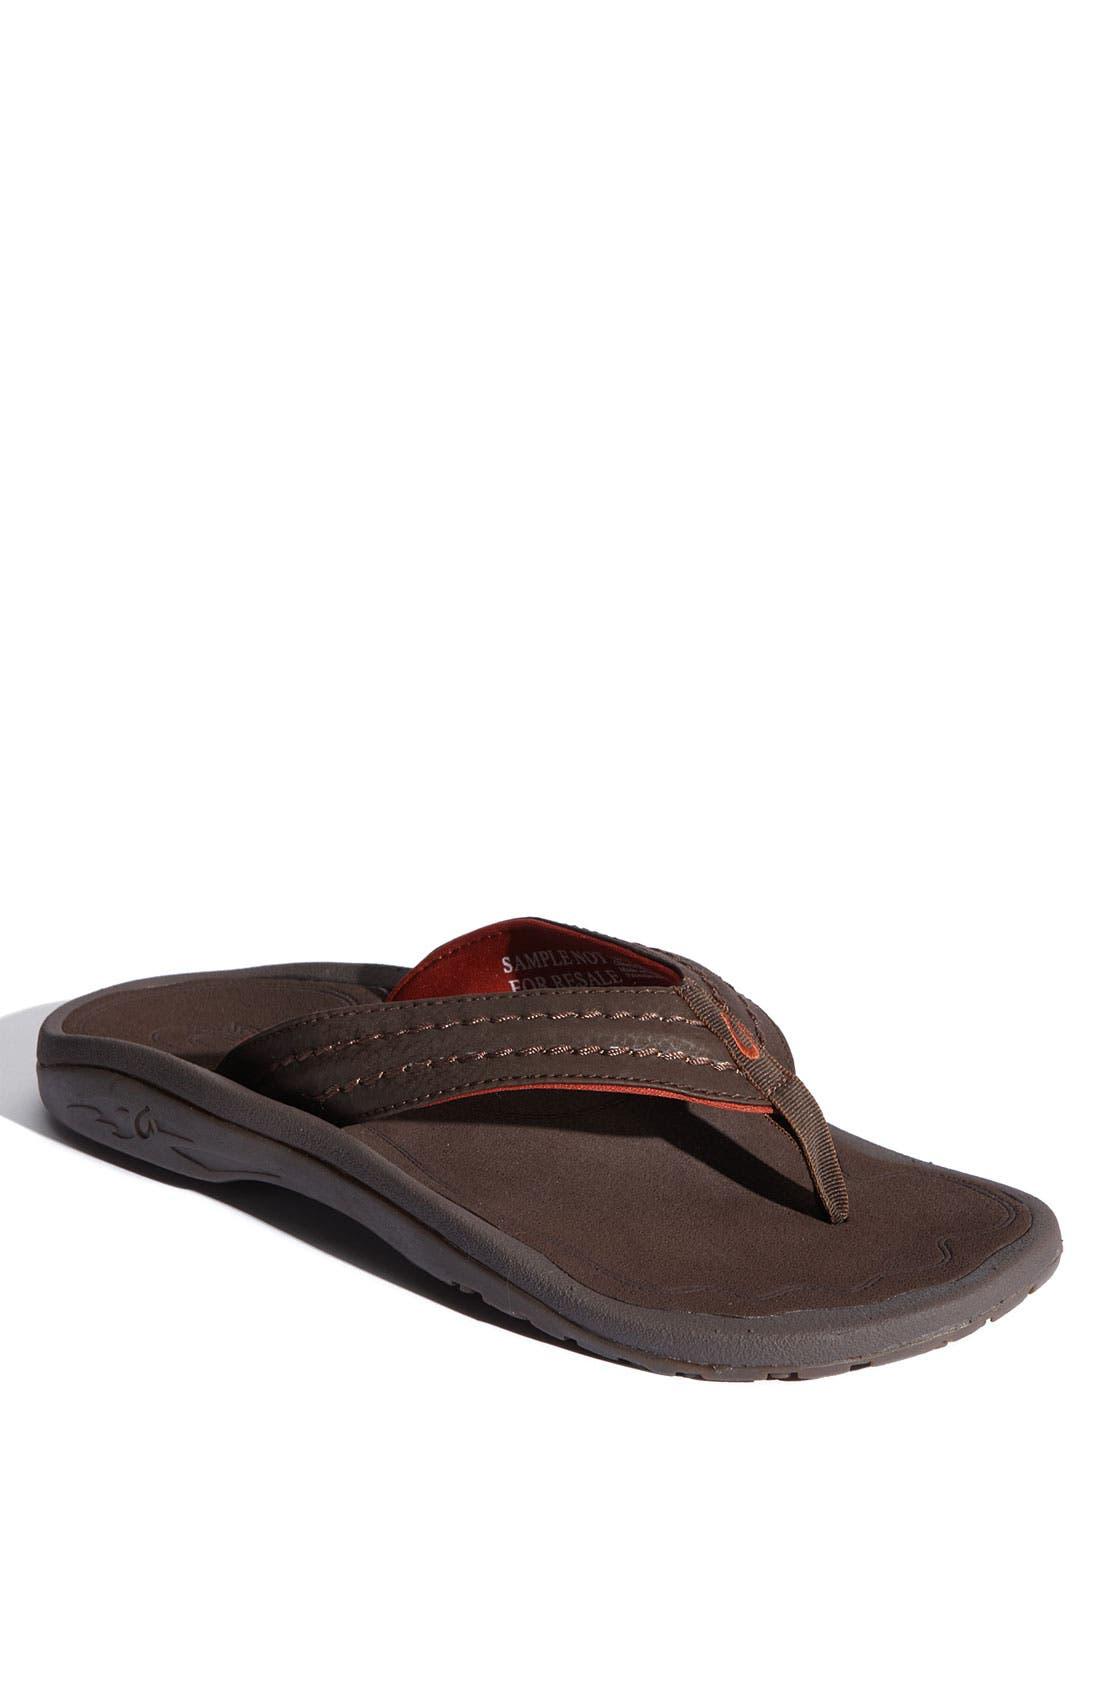 OluKai 'Hokua' Flip Flop (Regular Retail Price: $69.95)